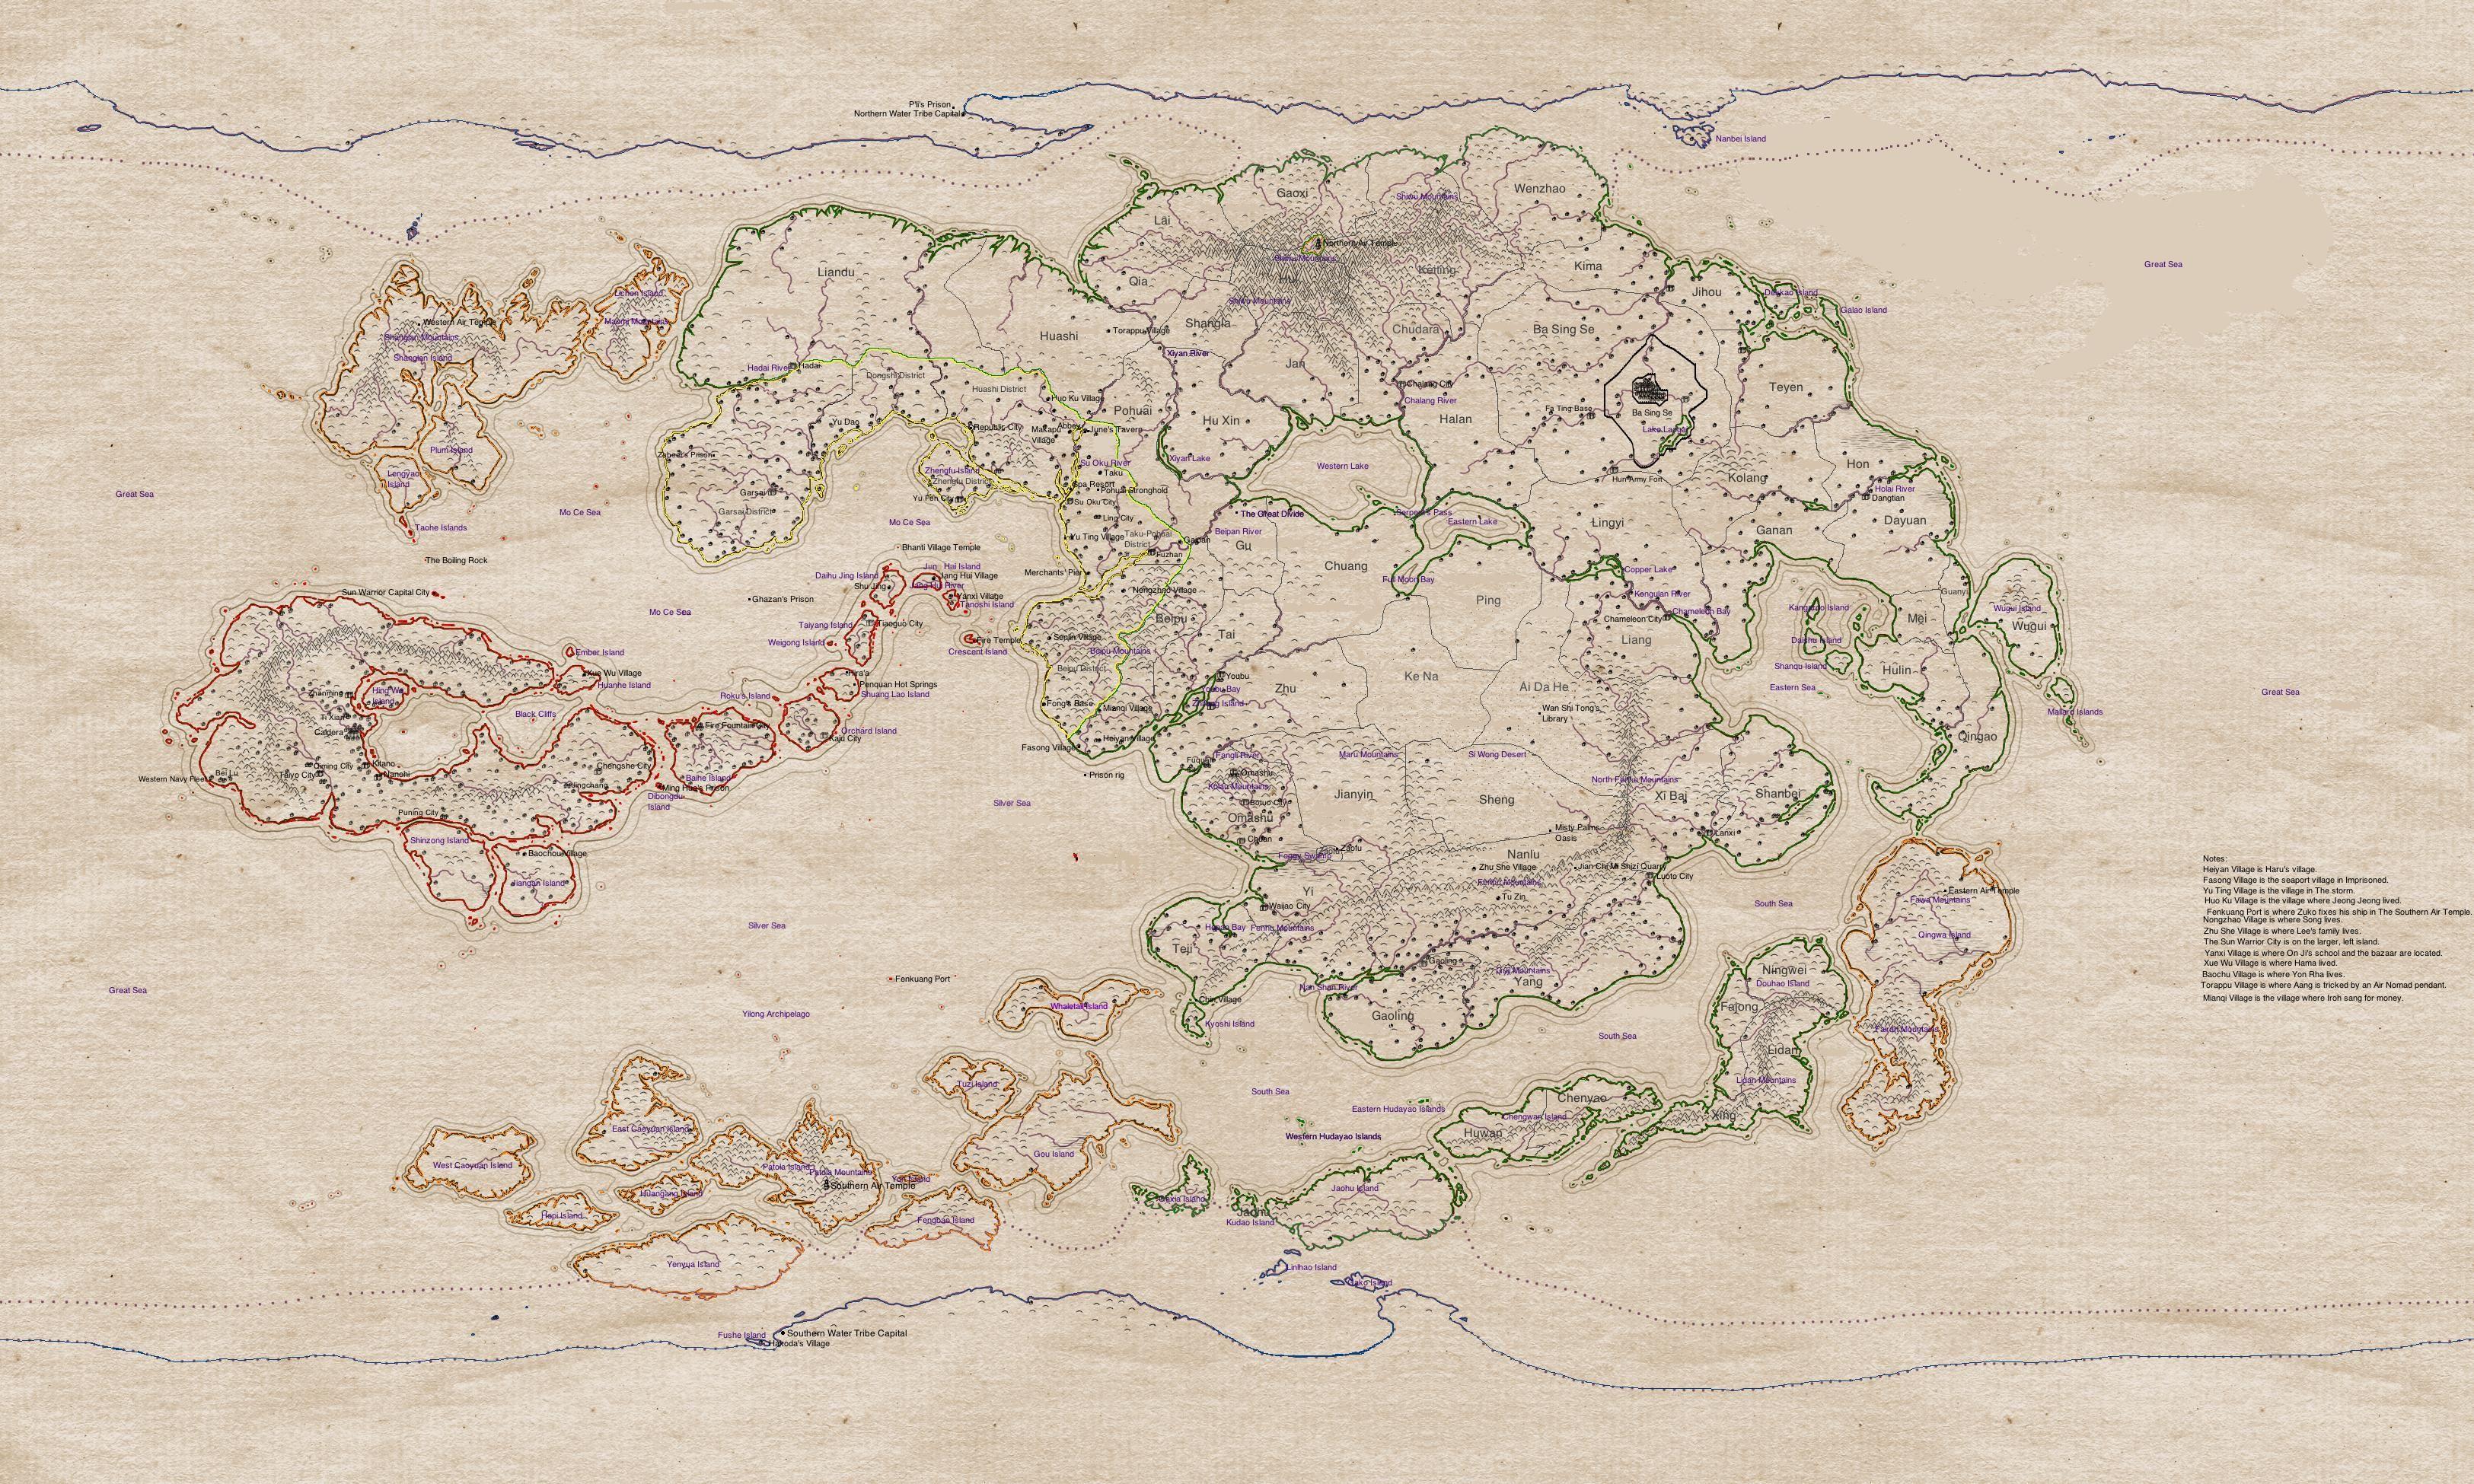 Avatar Map Album on Imgur Artful Delights Pinterest Avatar and RPG